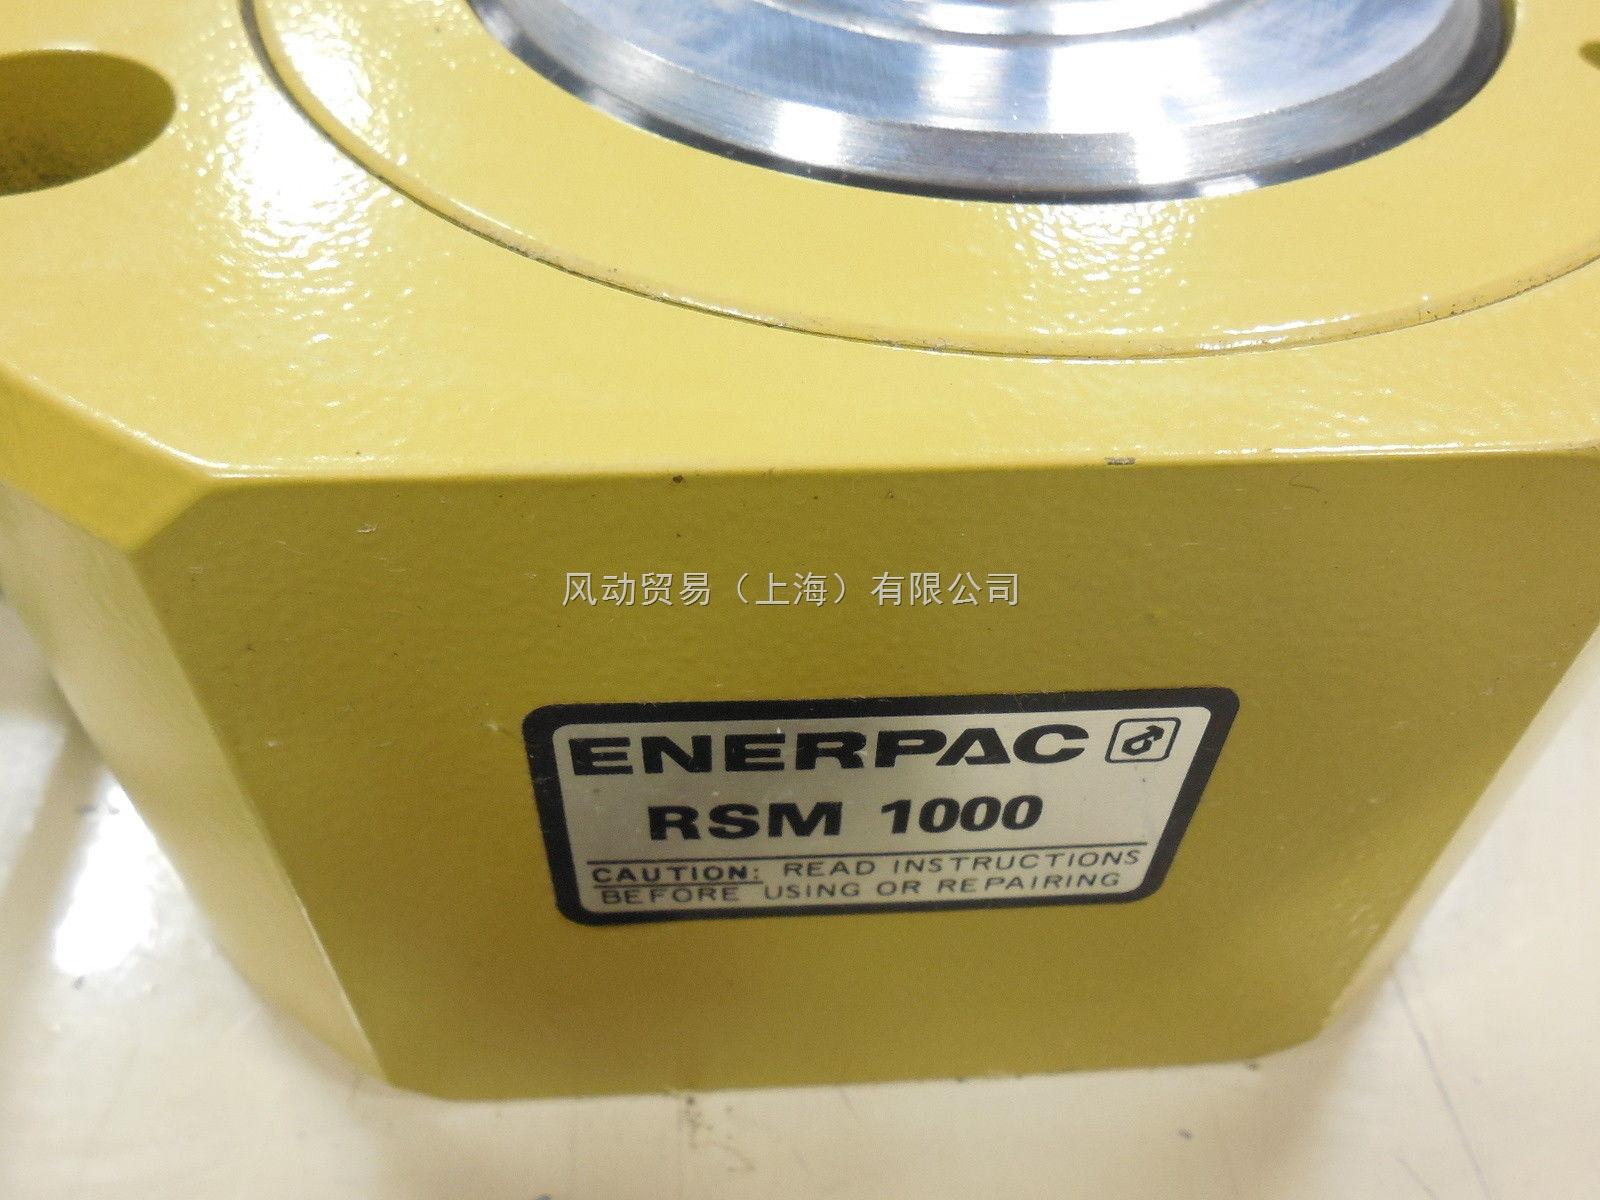 "ENERPAC RSM 1000 风动贸易(上海)有限公司优势供应国外知名品牌 美国ATI H2S NH3报警仪探头""A14/A11 A14/A11-11-0010-2-1 "" 美国PRINCO物位控制器L2000 Null-KoTe 德国HOHNER编码器 美国Farris安全阀27CA13-M20S4,编号459697-2-KE,接头尺寸1/2""NPTM*1""NPTF,设定值4730Kpa用于新破乳剂泵P-4940A/B 美国Baseline PID-TECH光离子传感器(实单)有图片""PN"